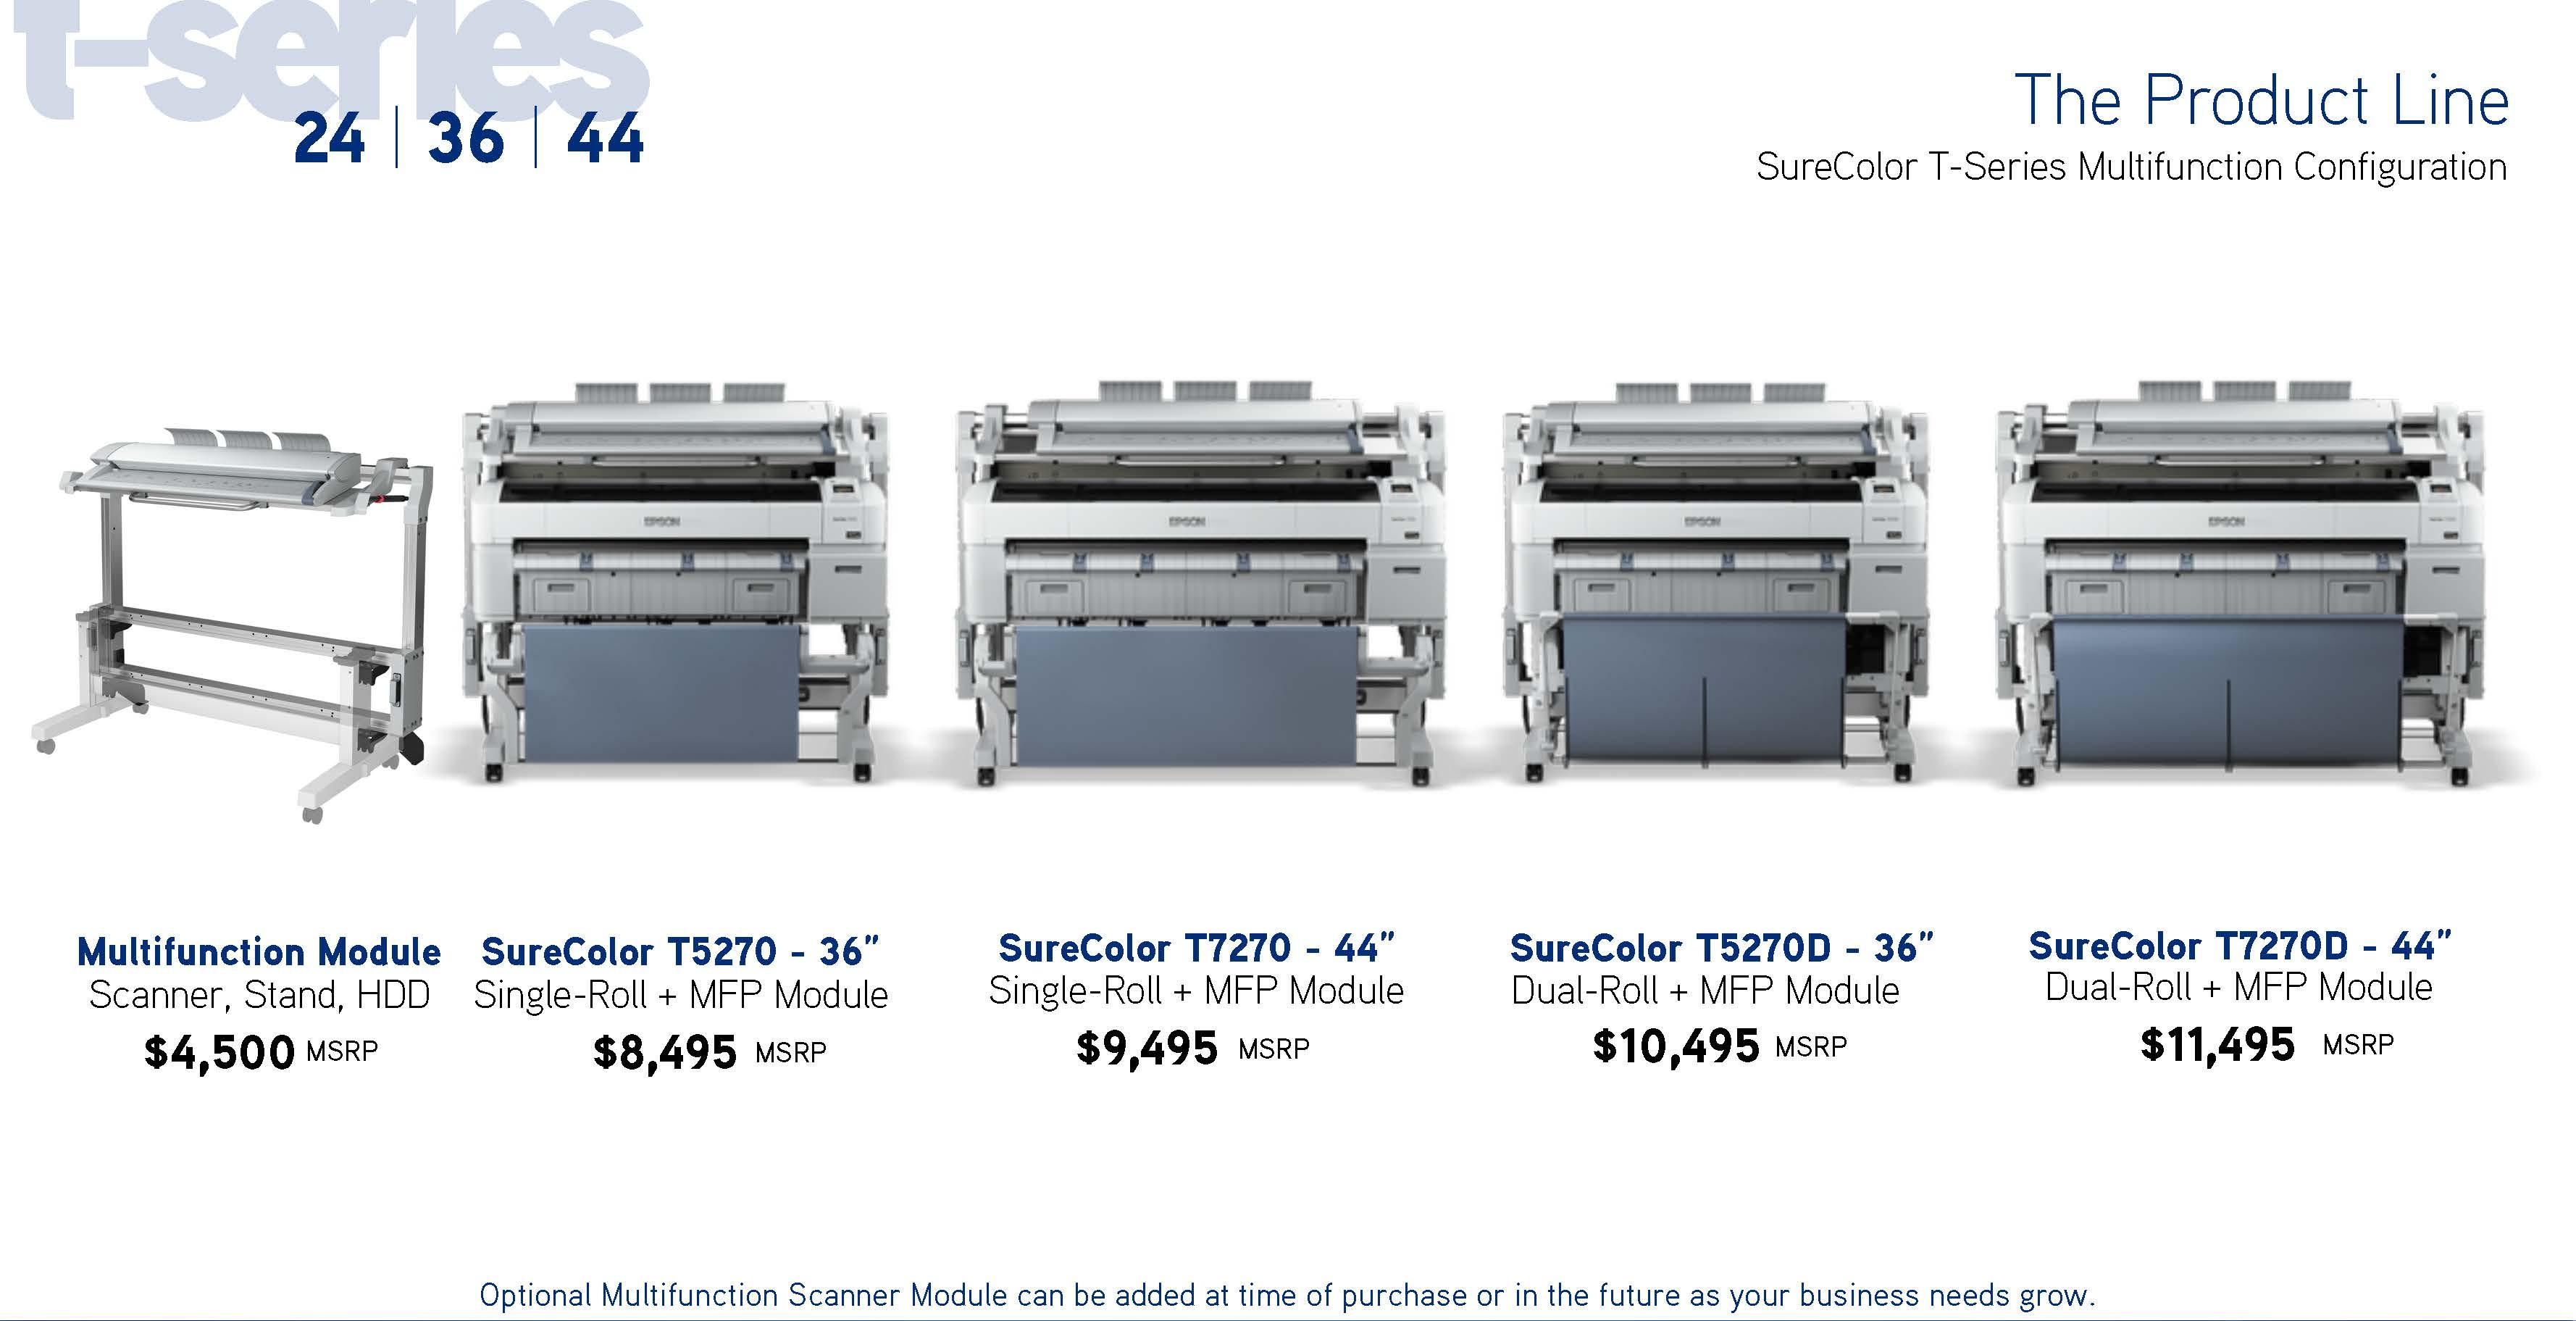 SureColor T-Series Multifunction Configuration